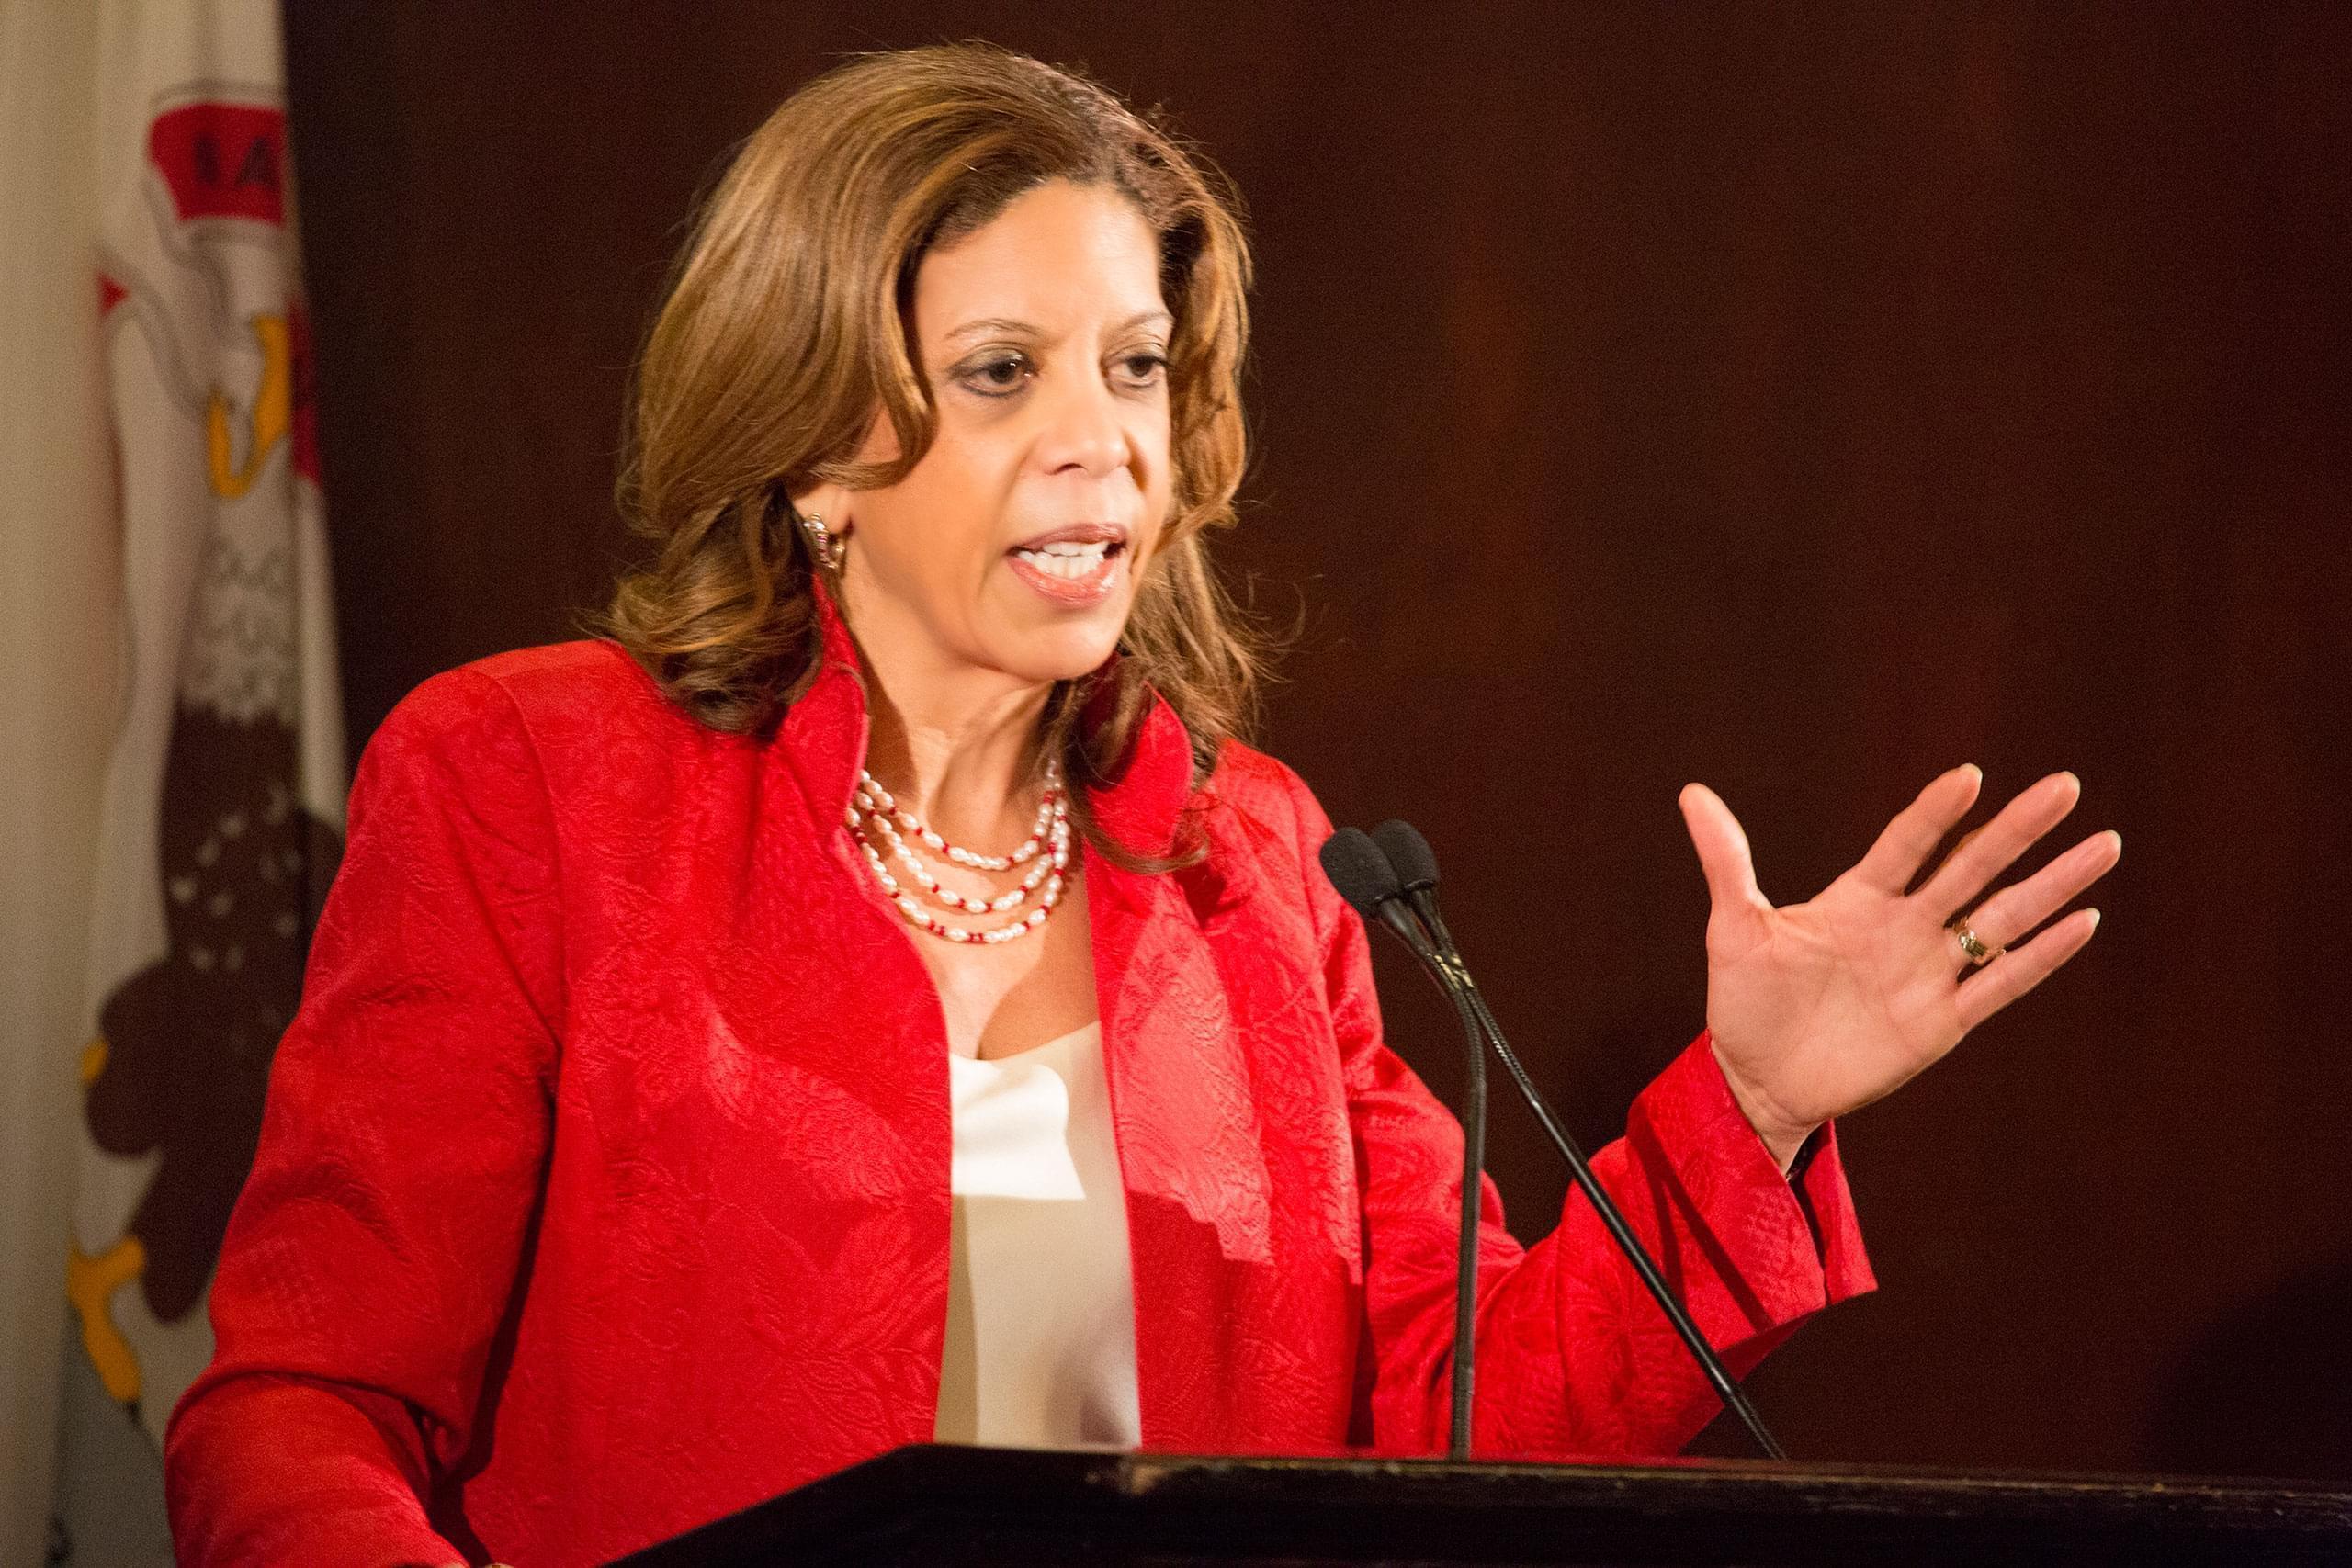 Democratic U.S. Senate candidate Andrea Zopp